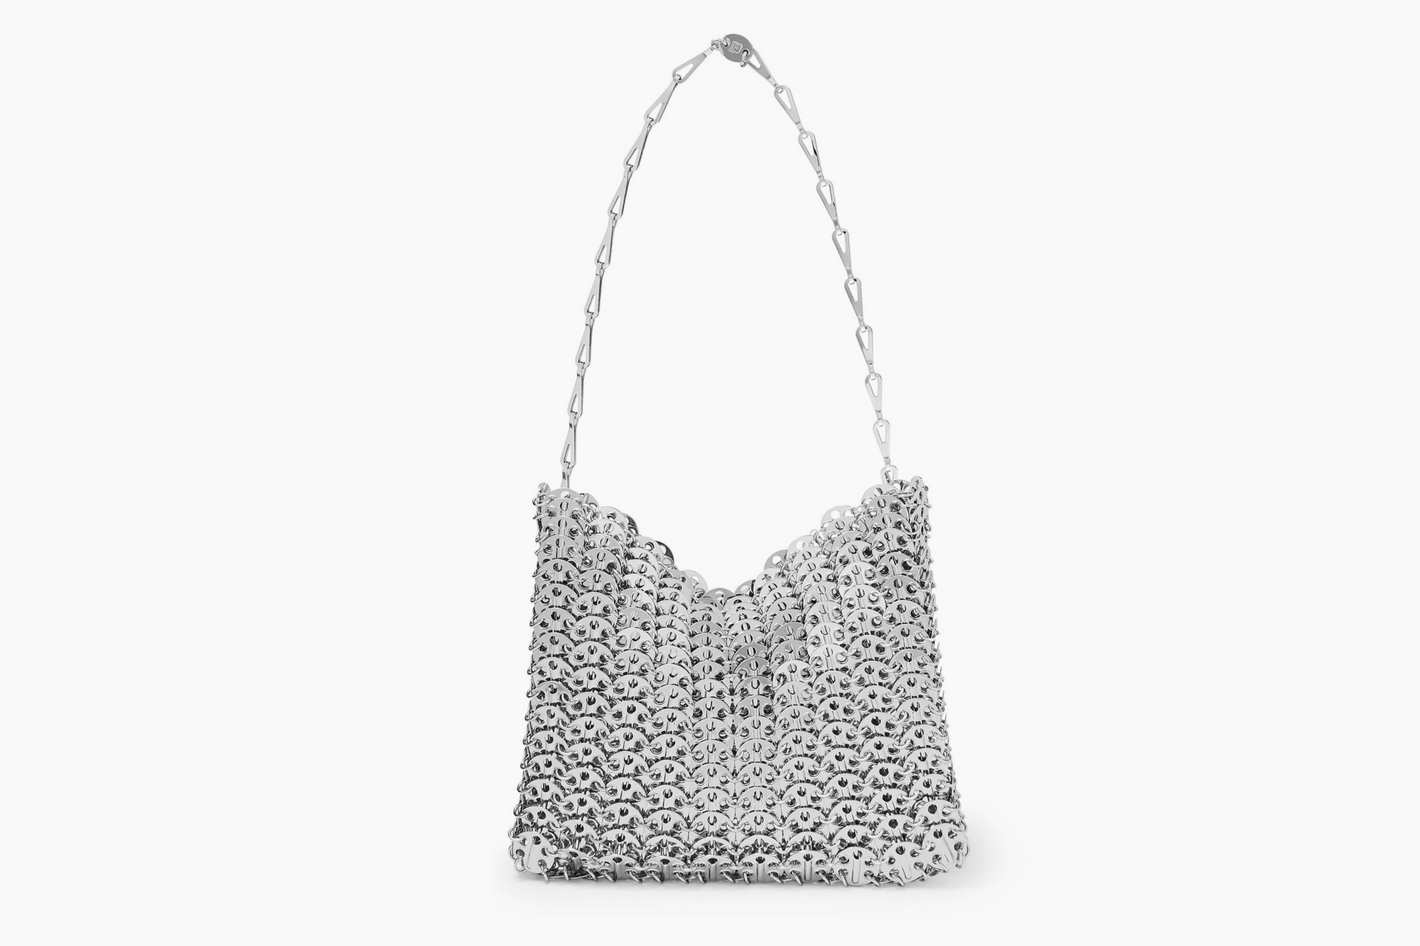 1969 chainmail shoulder bag